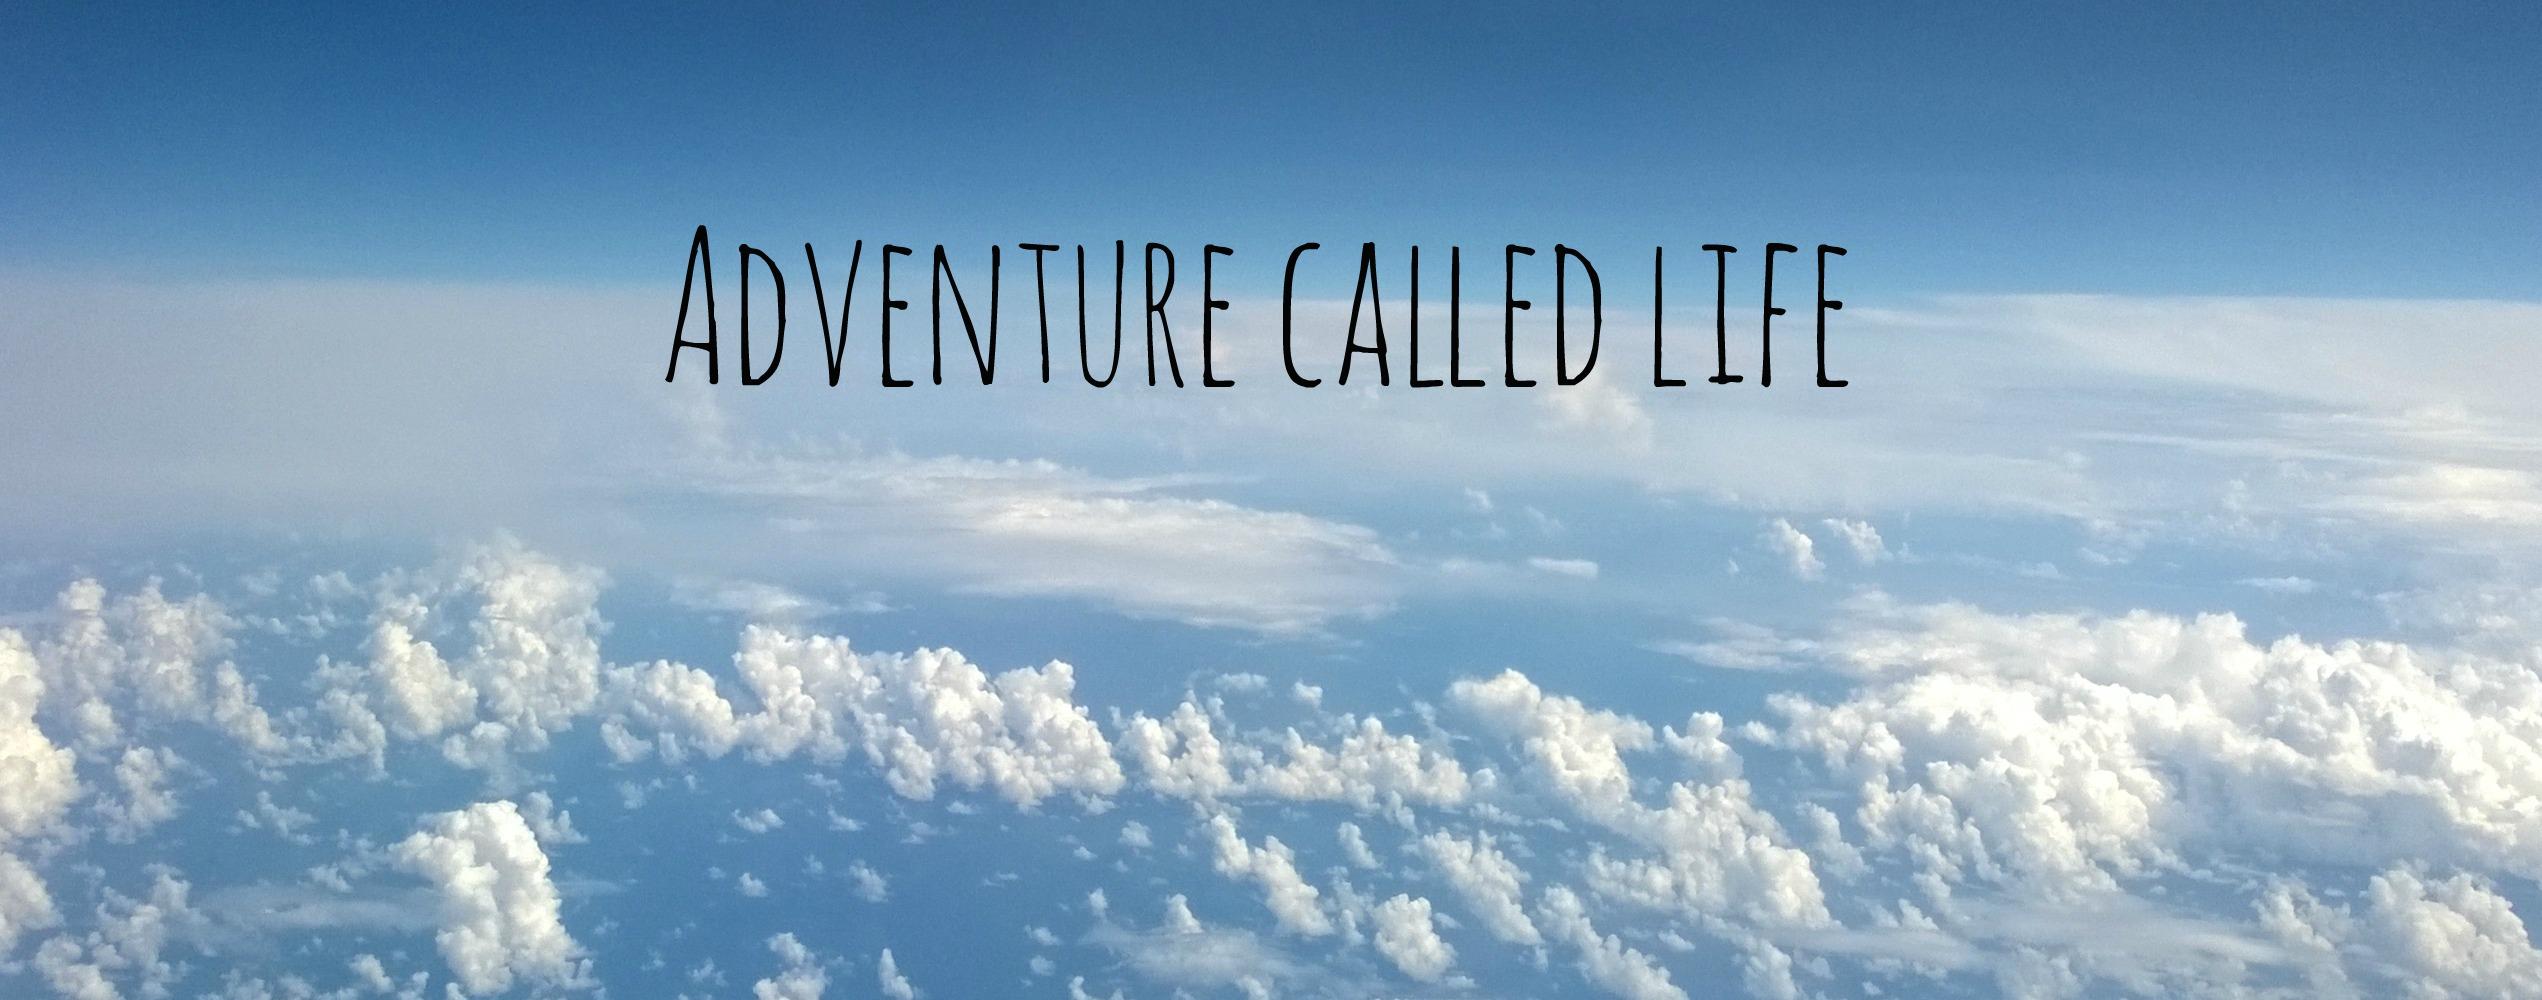 Adventure called Life